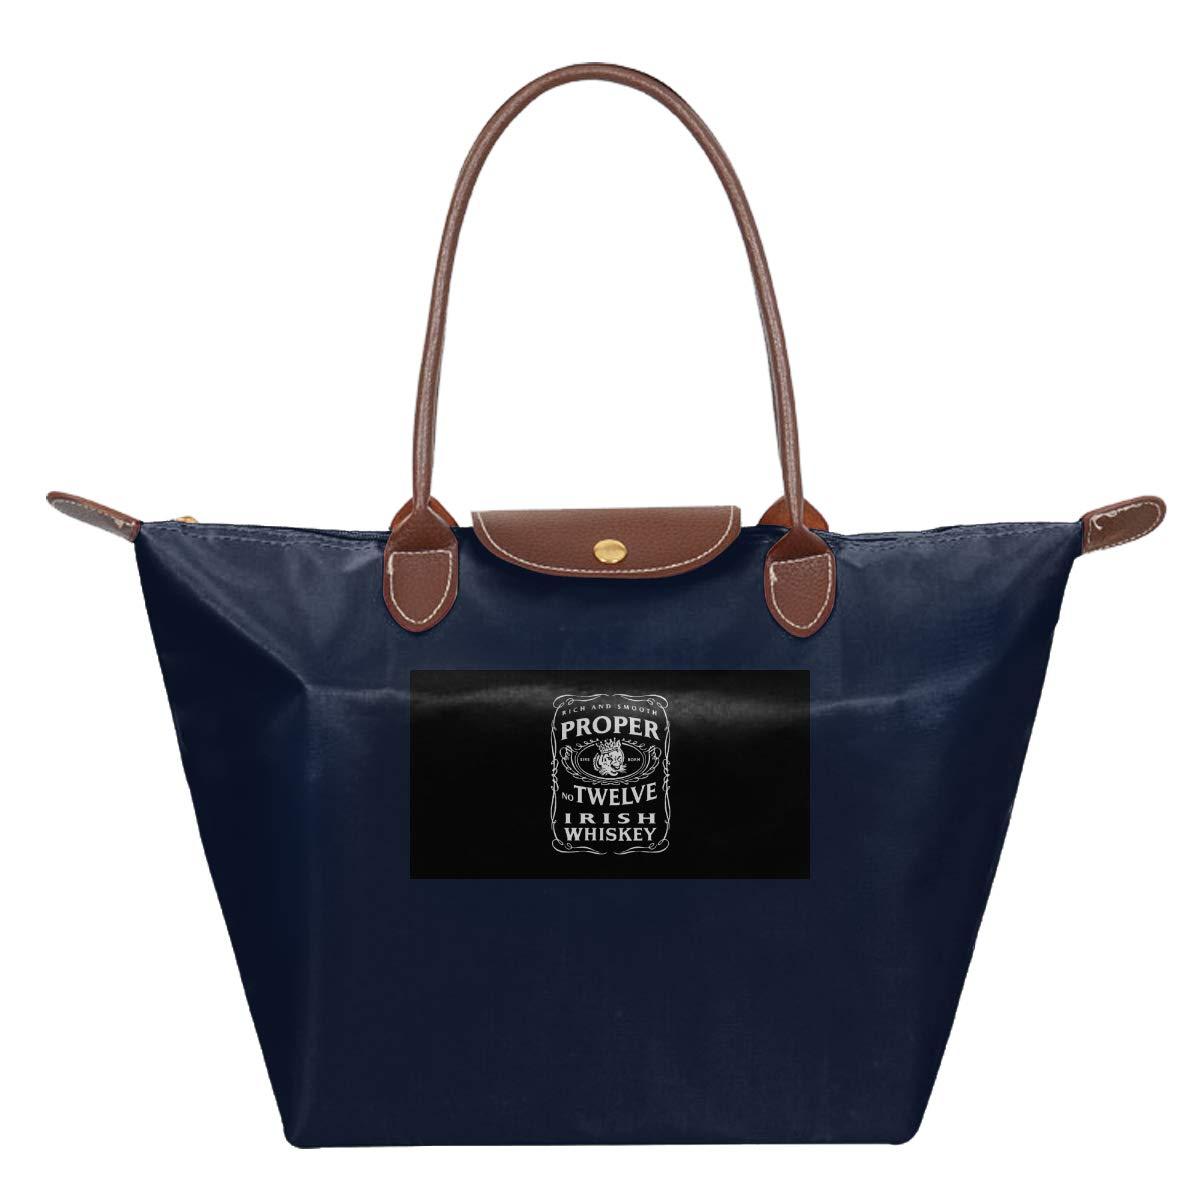 Proper 12 Irish Whiskey McGregor Inspired Print Design Waterproof Leather Folded Messenger Nylon Bag Travel Tote Hopping Folding School Handbags